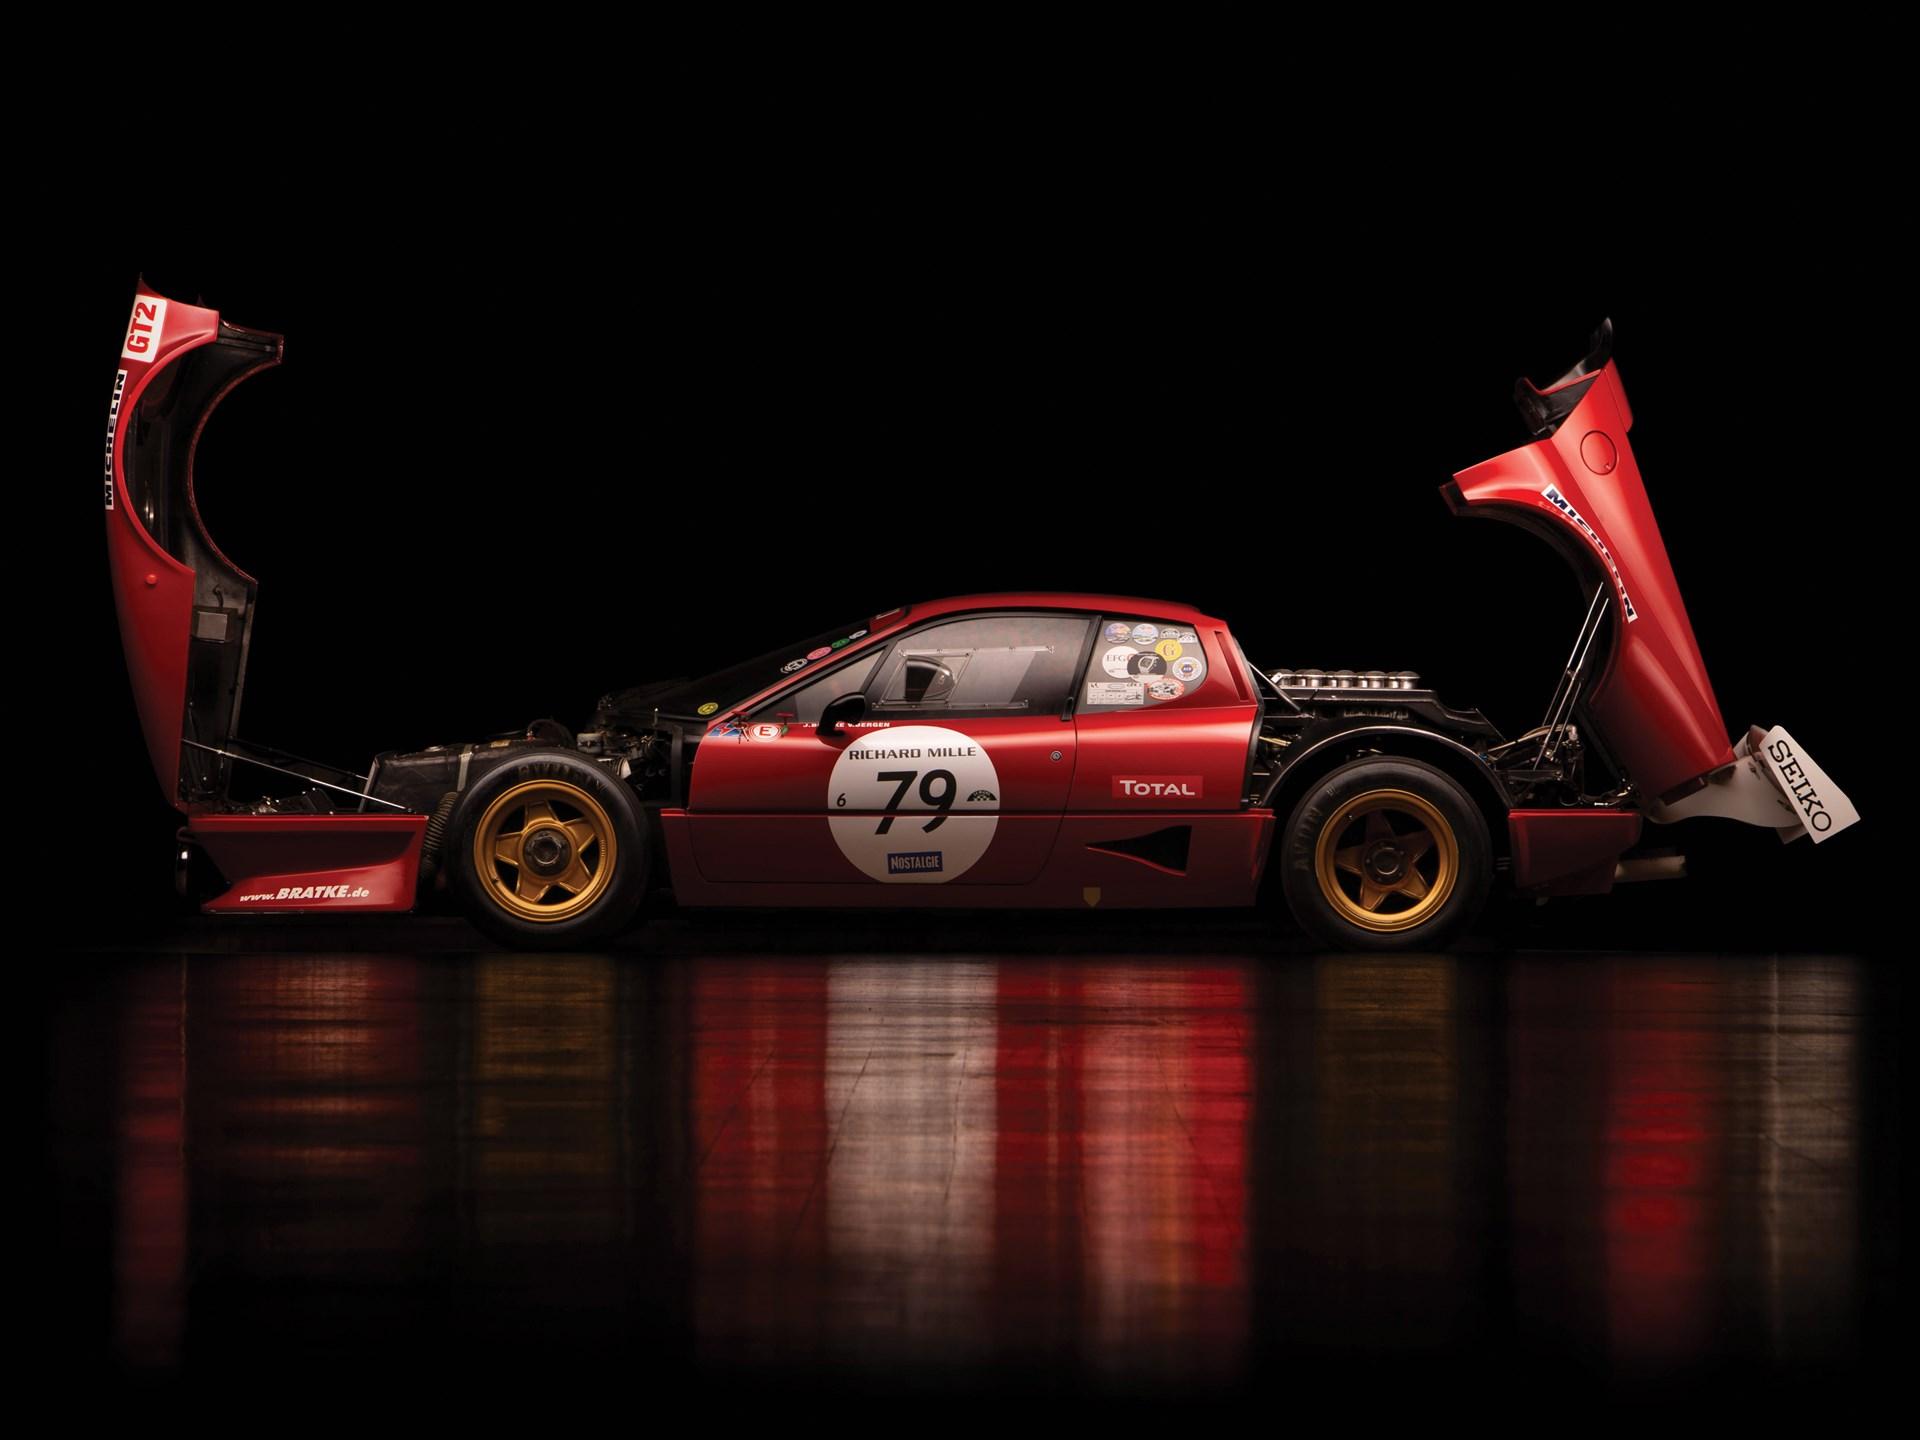 1980 Ferrari 512 BB Competizione side profile hoods up